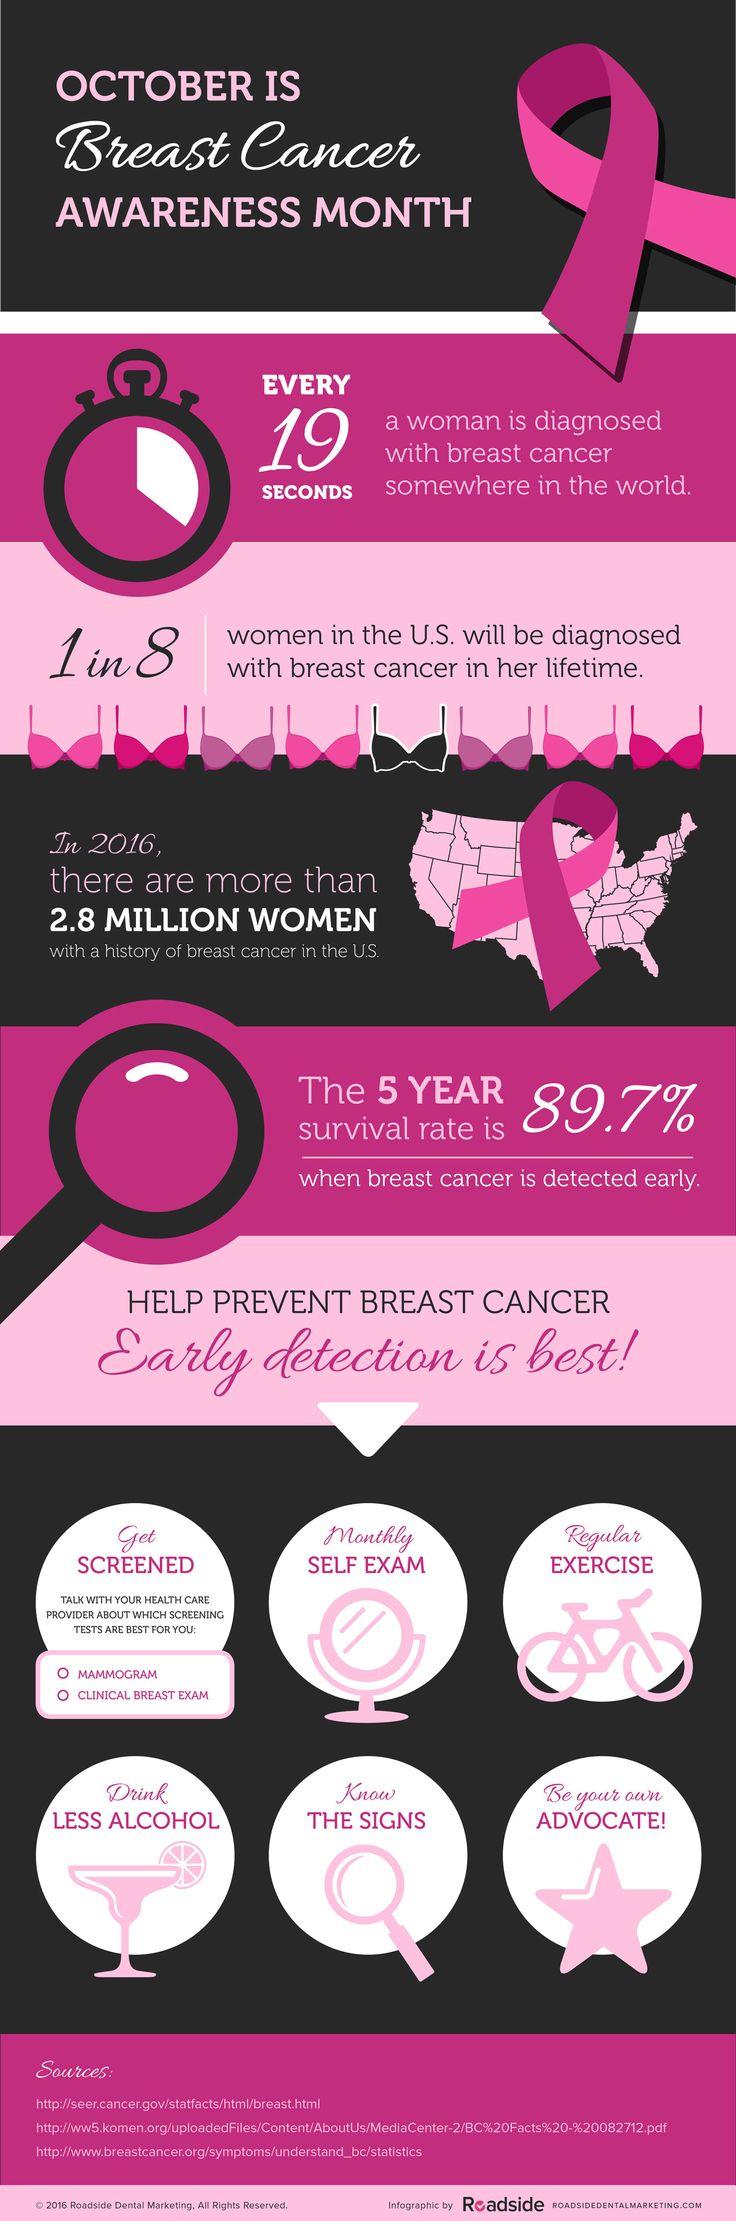 Breast cancer awareness deals